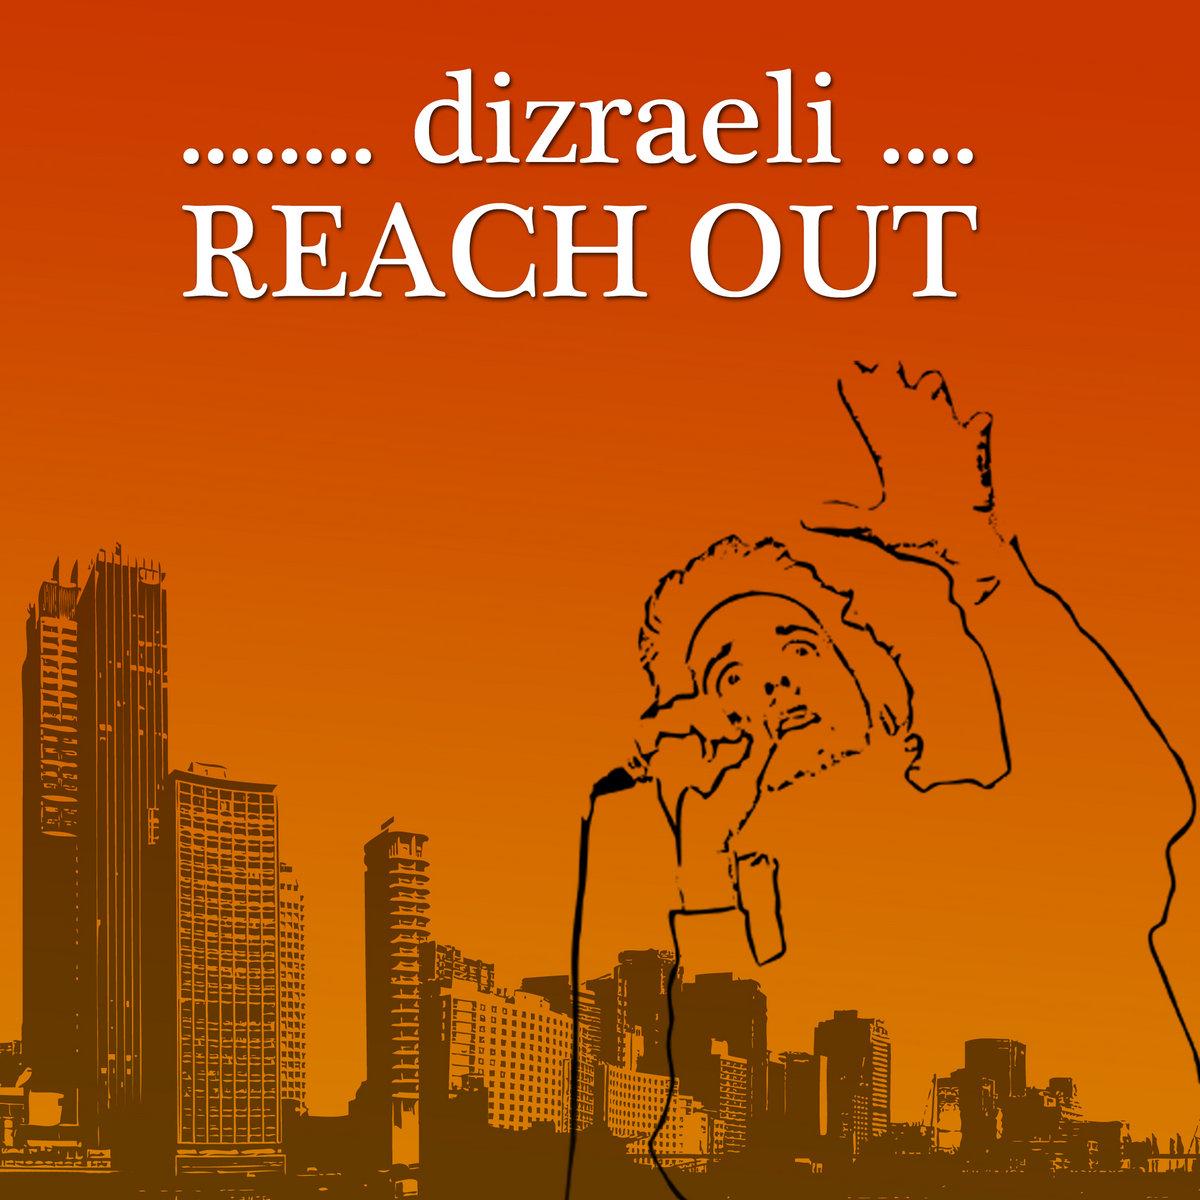 Free download! Reach out | dizraeli.